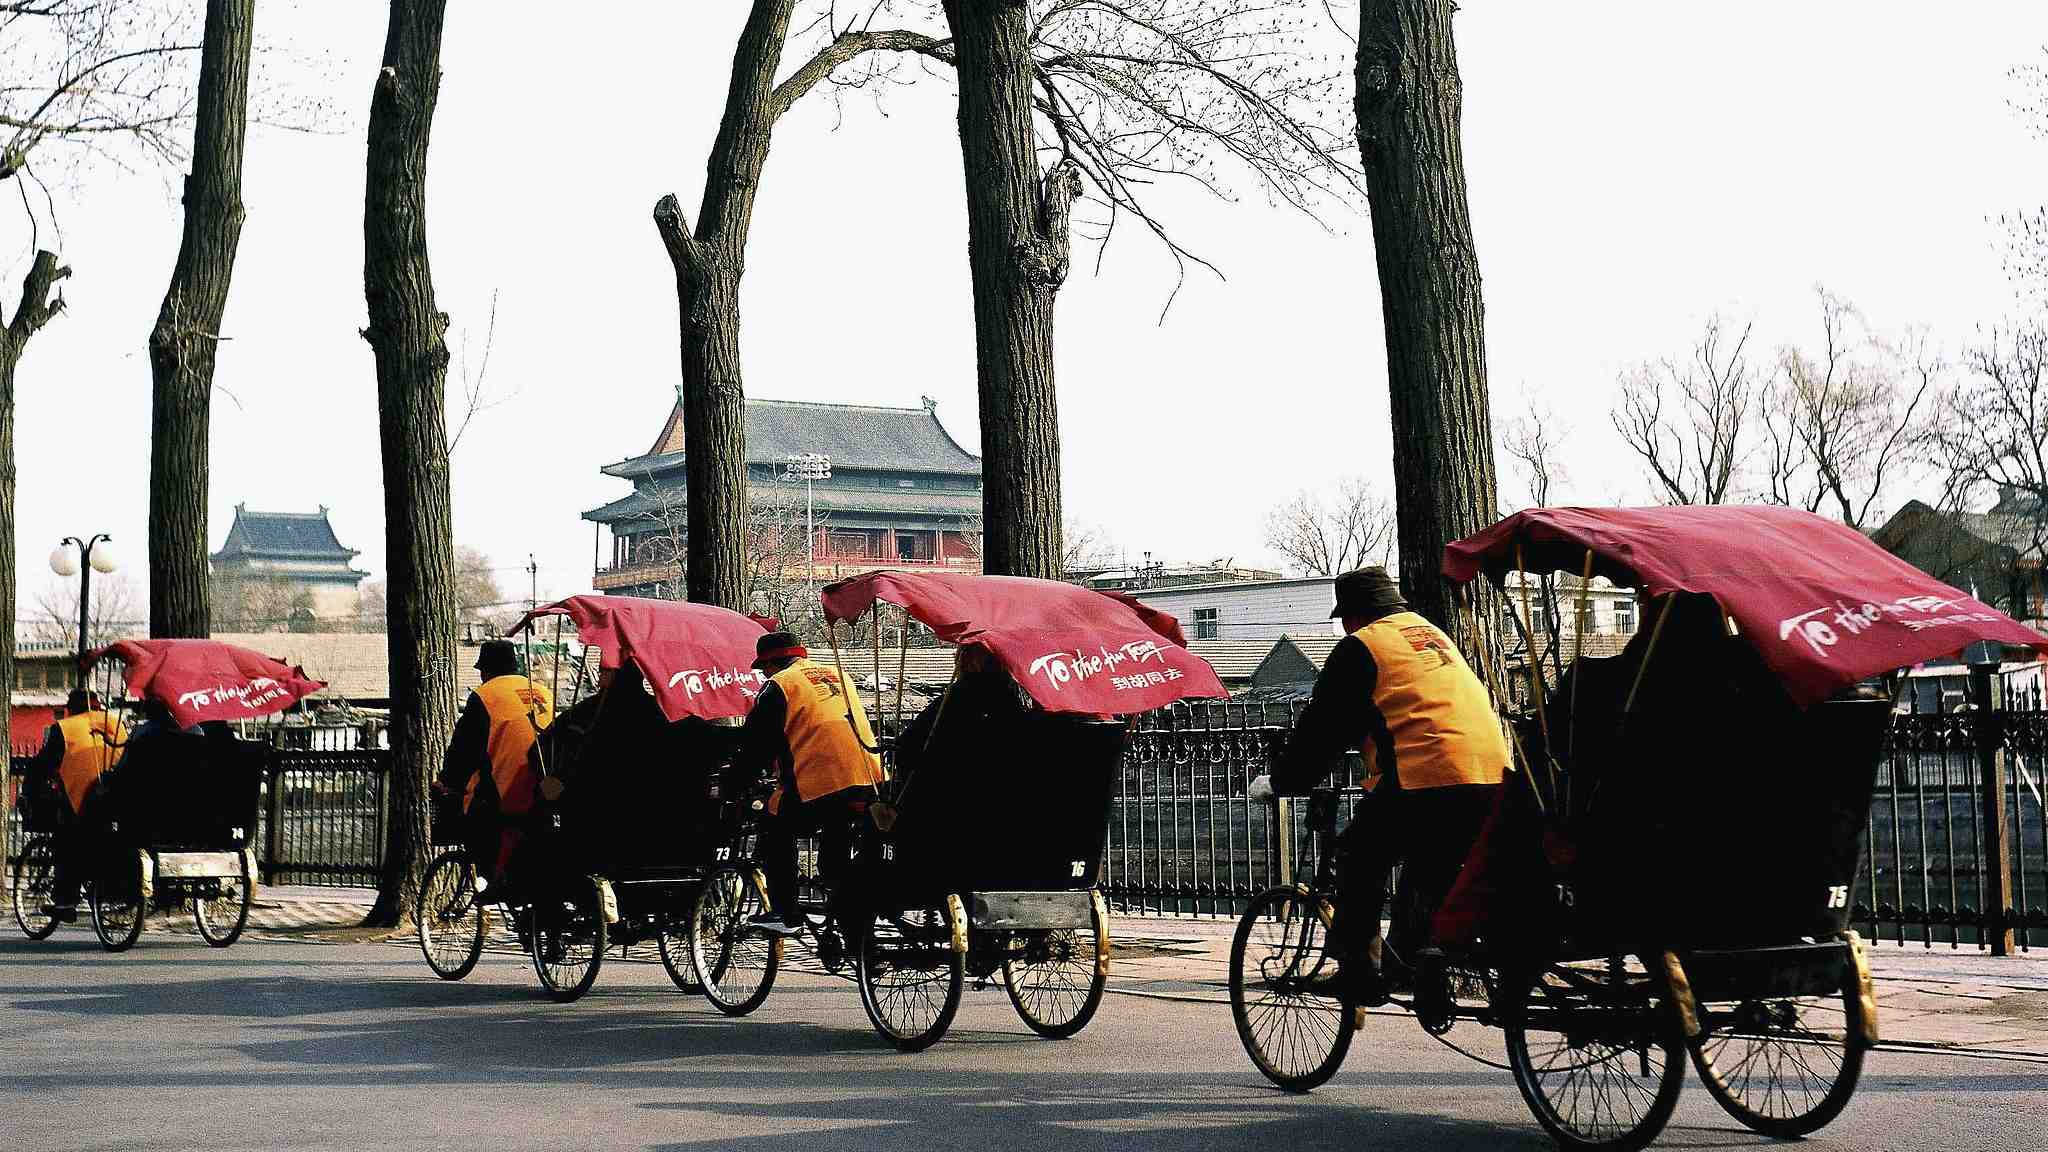 Beijing Hutong Tour: A peek into the city on rickshaw